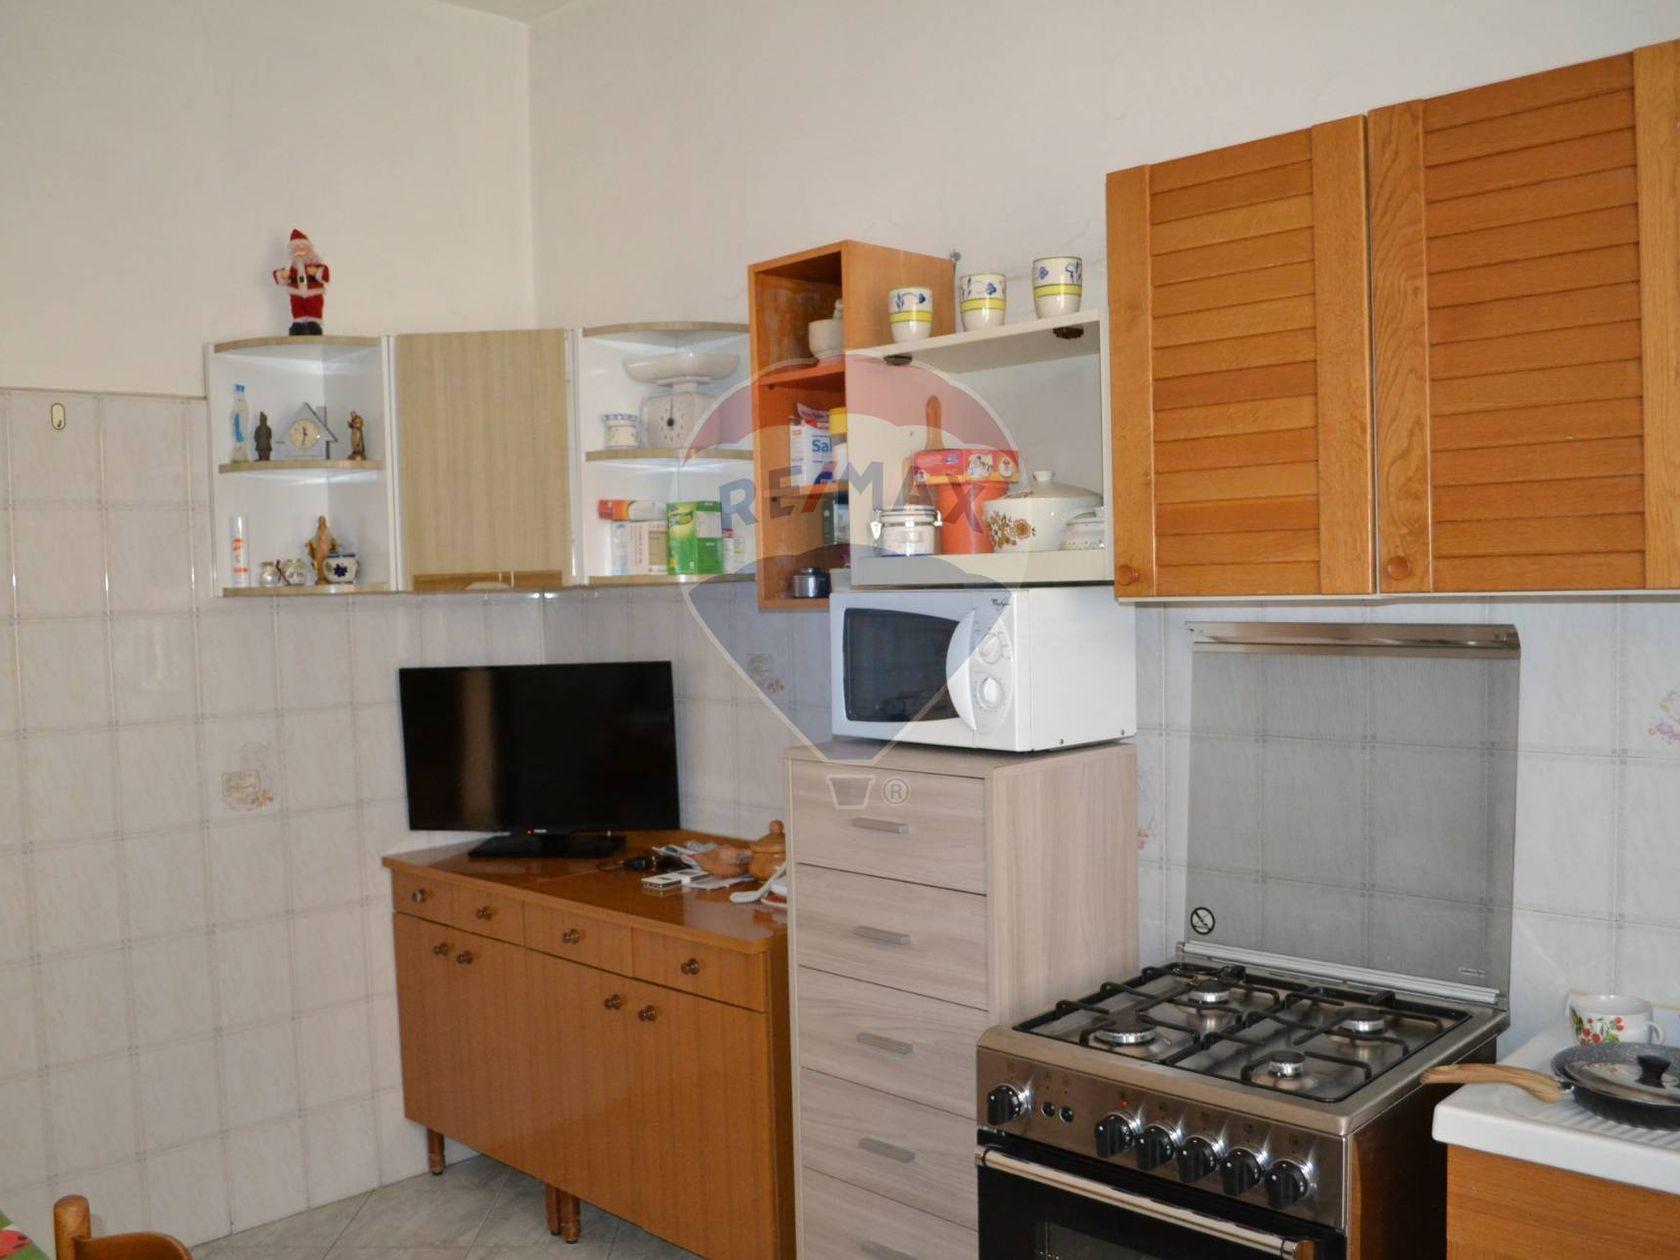 Appartamento Villa Adriana, Tivoli, RM Vendita - Foto 6